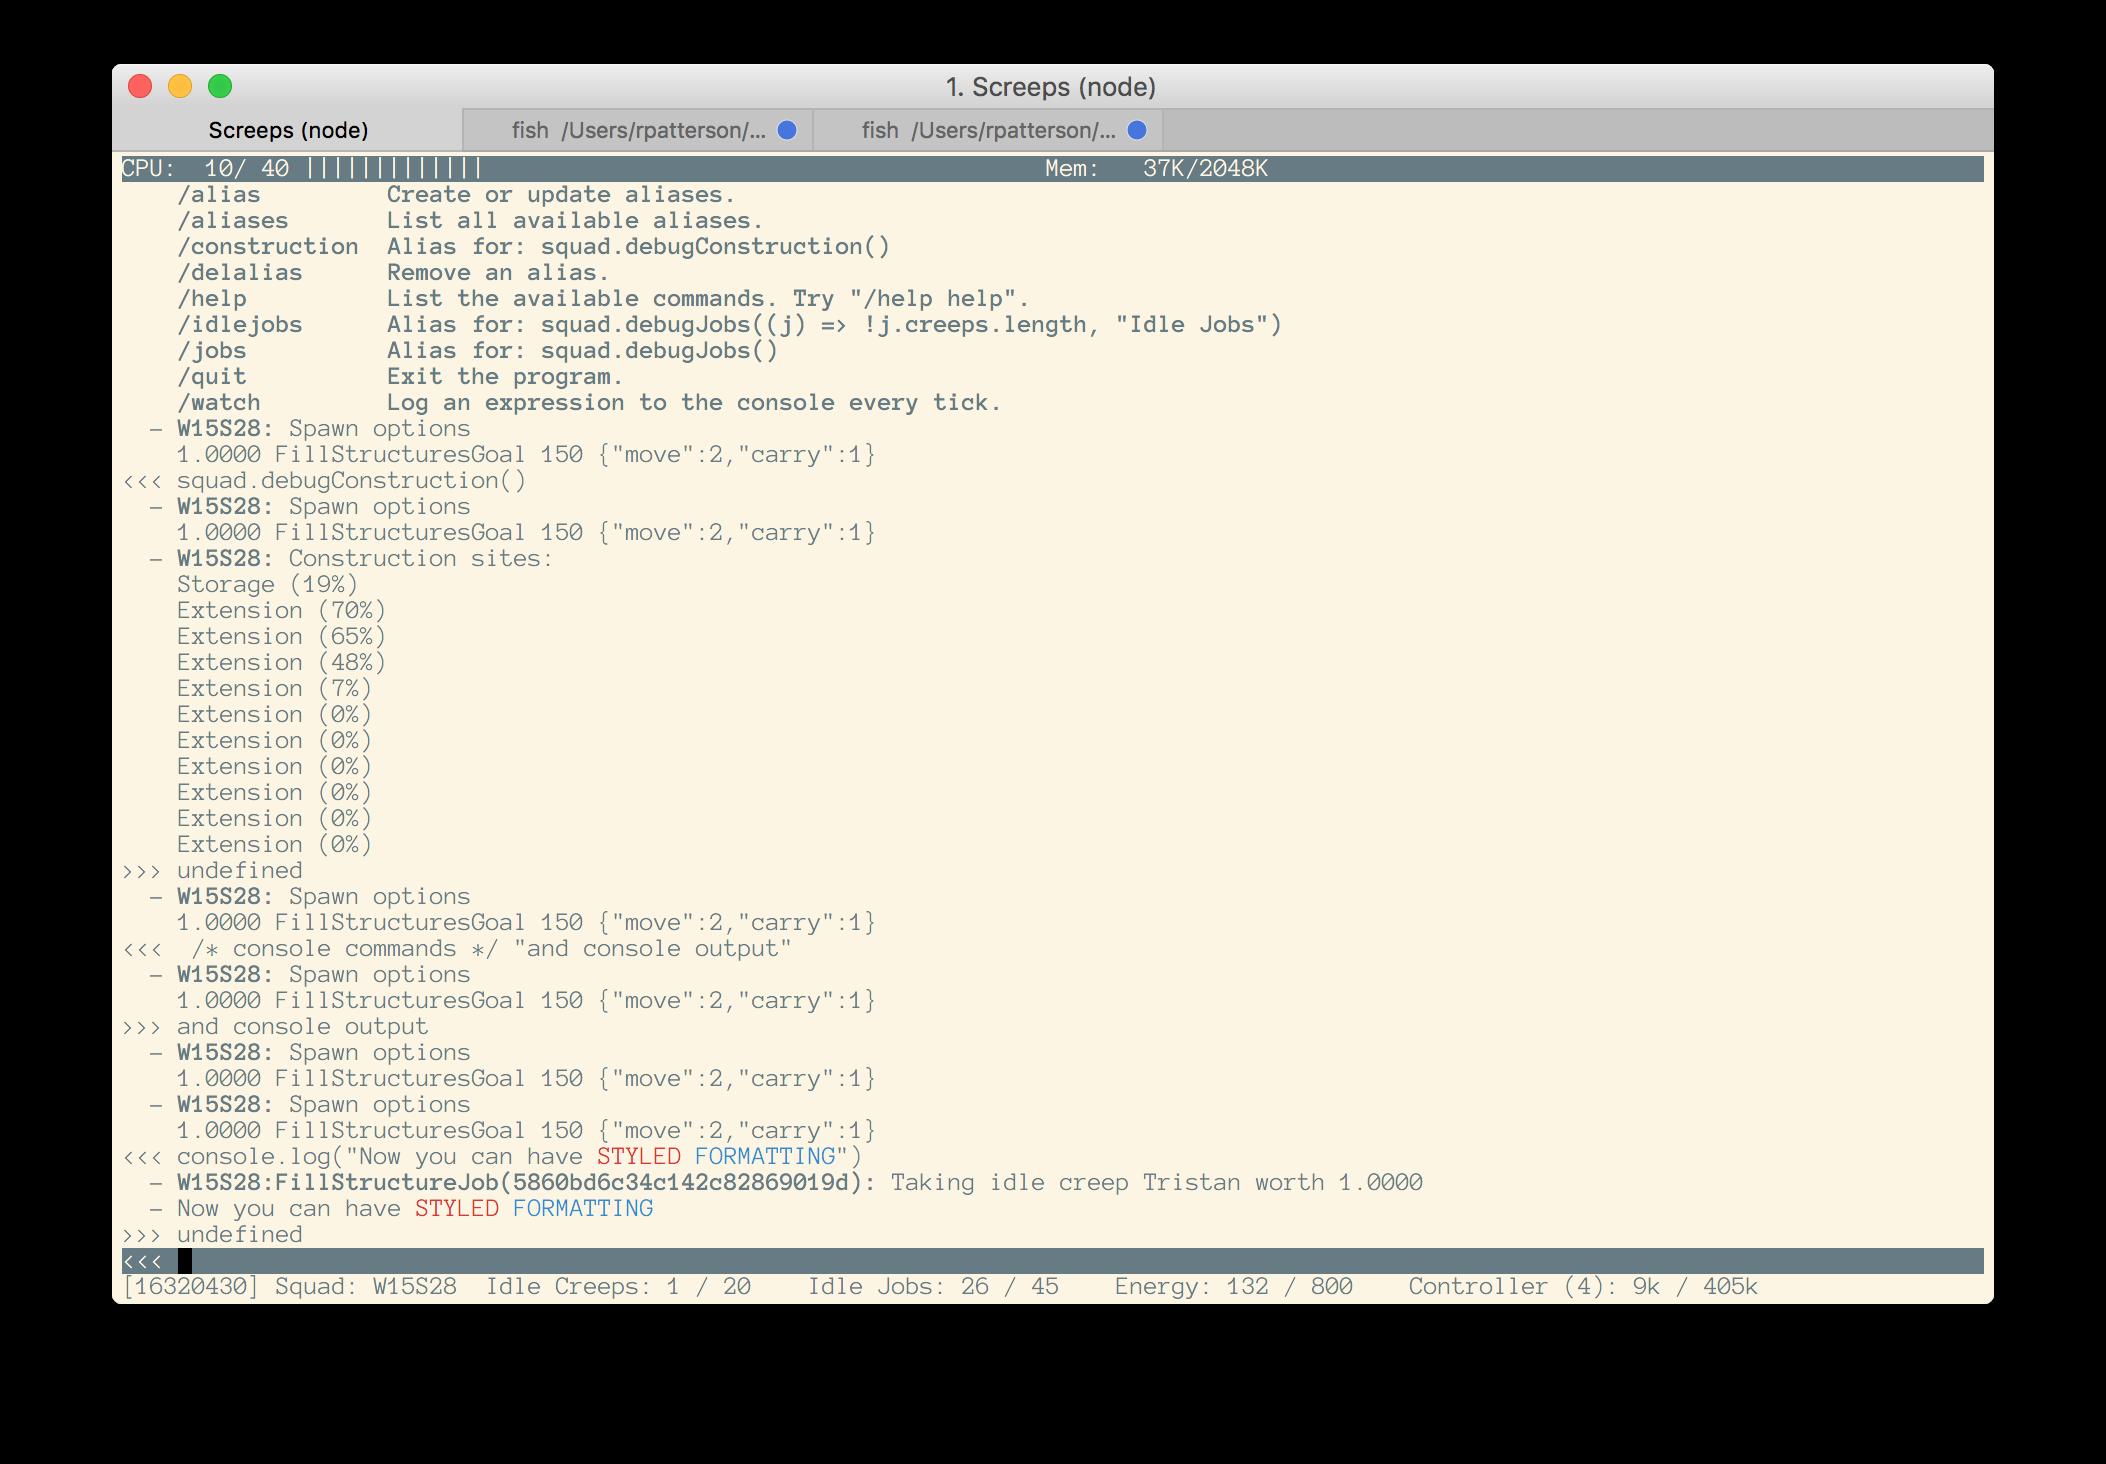 screenshot of main interface